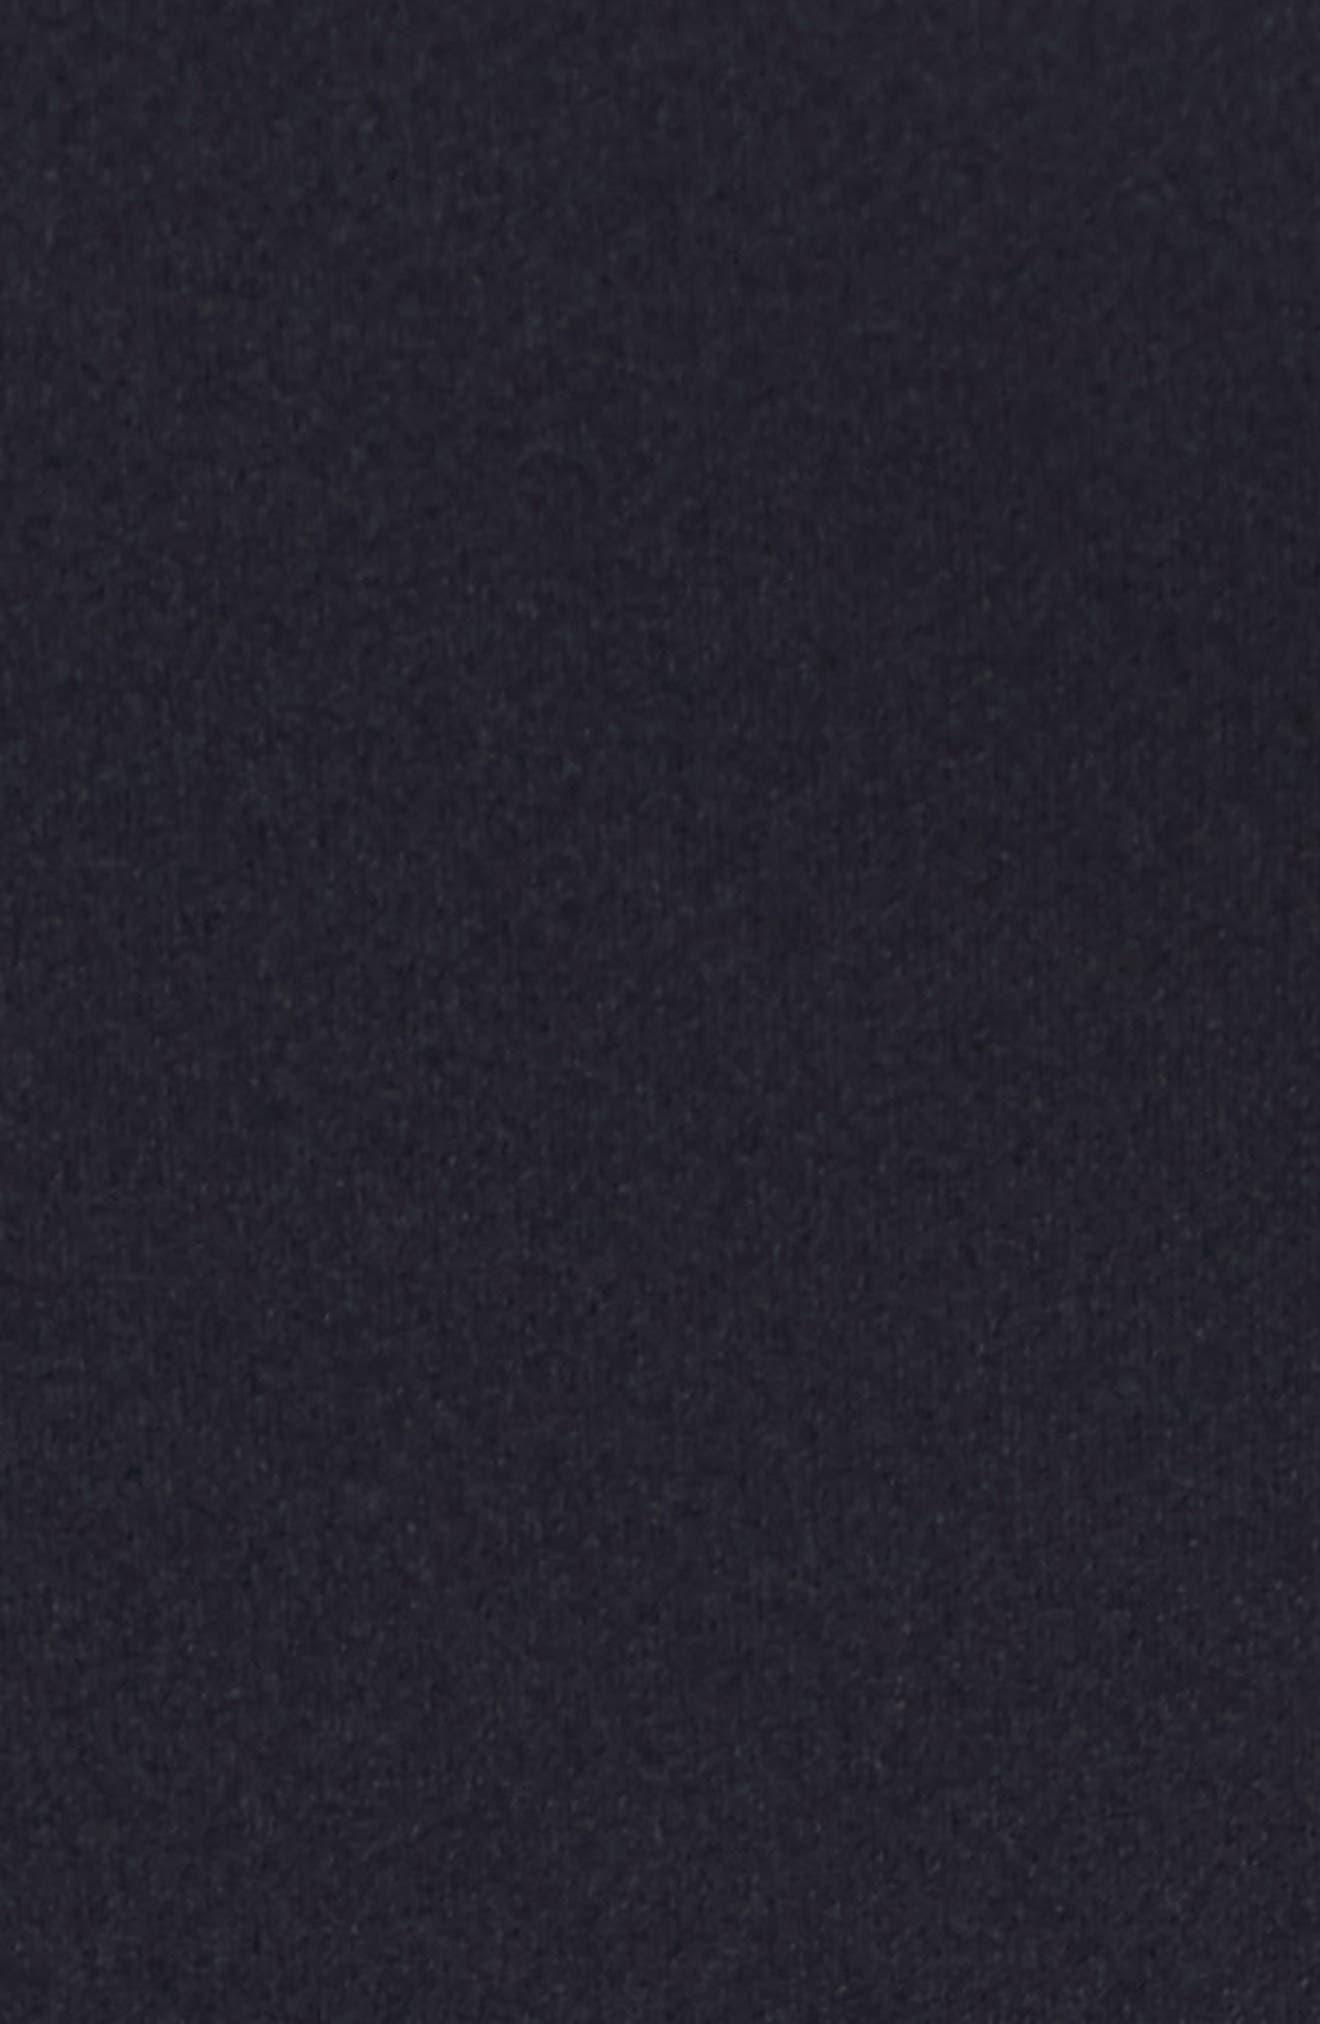 Cold Shoulder Sheath Dress,                             Alternate thumbnail 5, color,                             Dark Navy